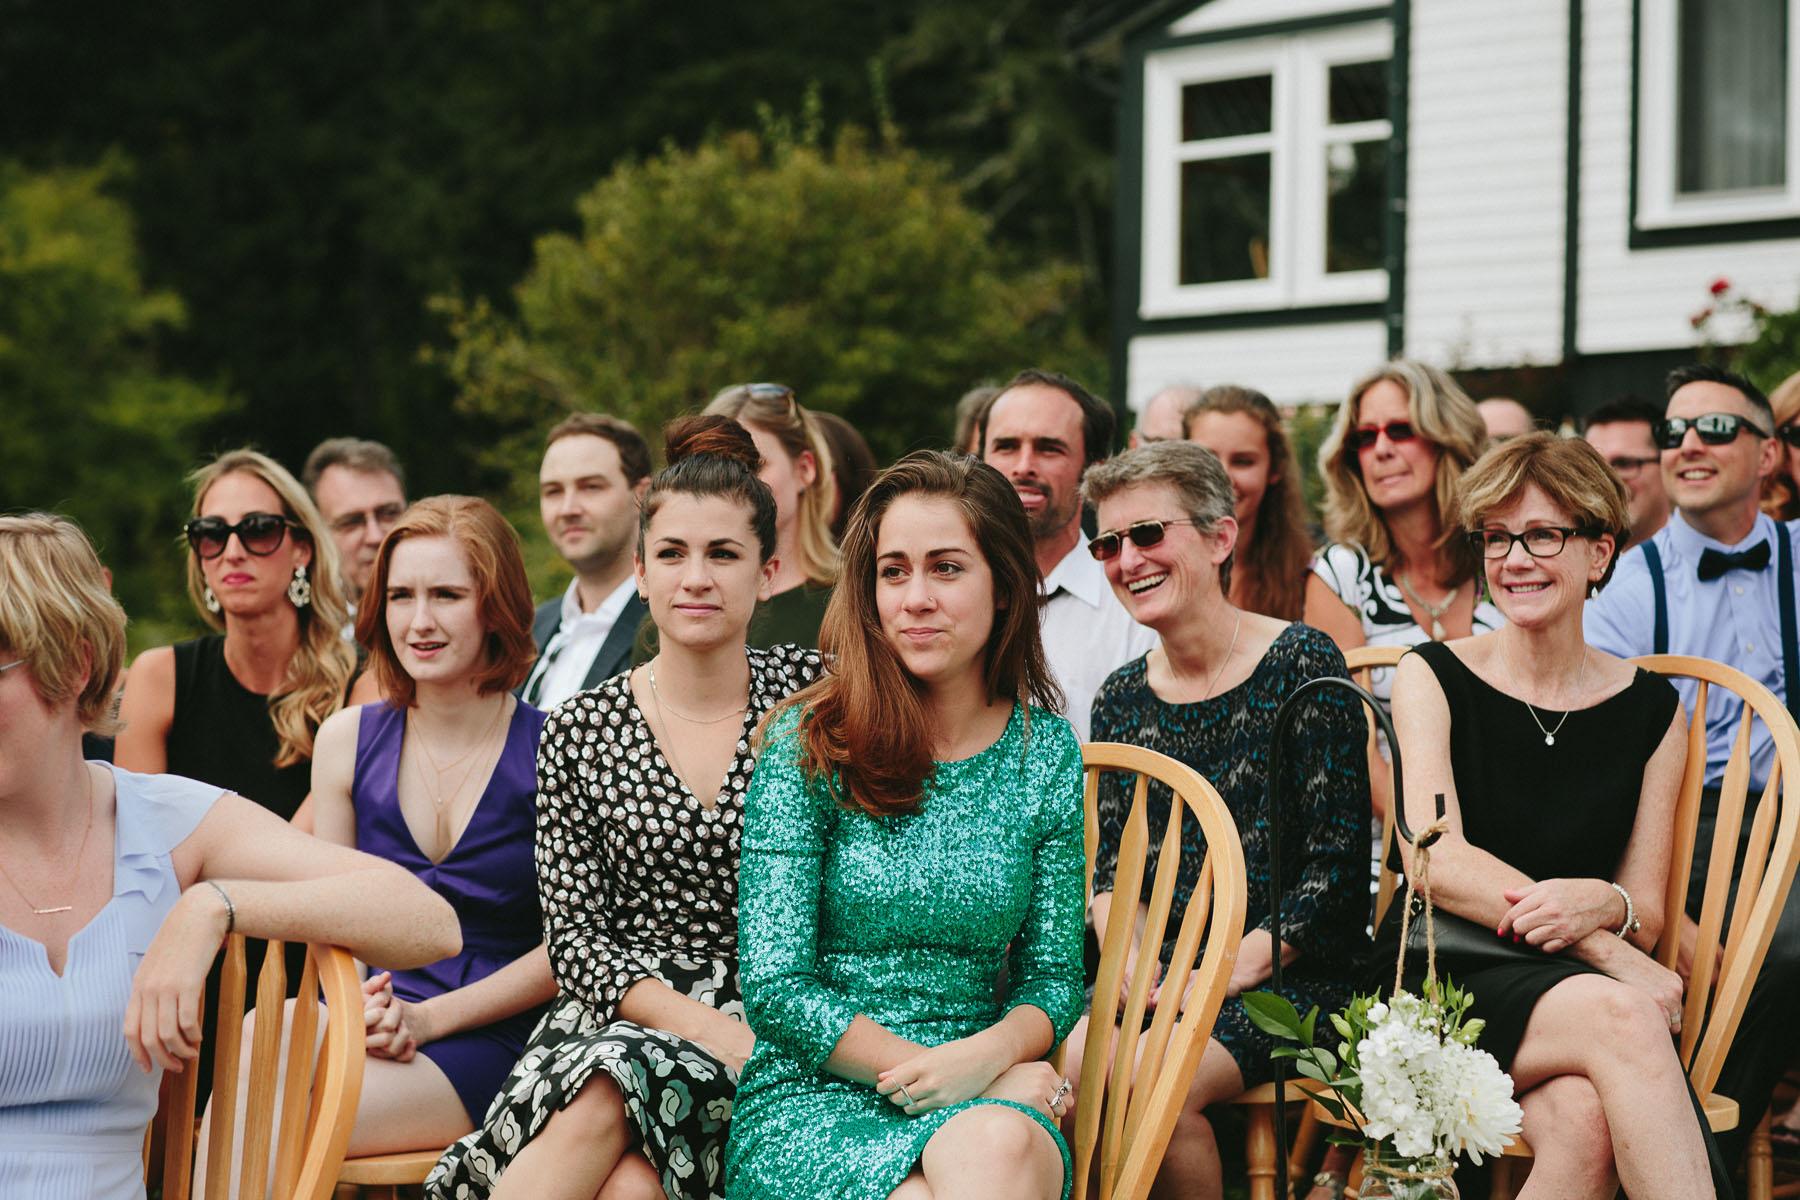 thetis-island-wedding-photographer-rp-rn-067.jpg